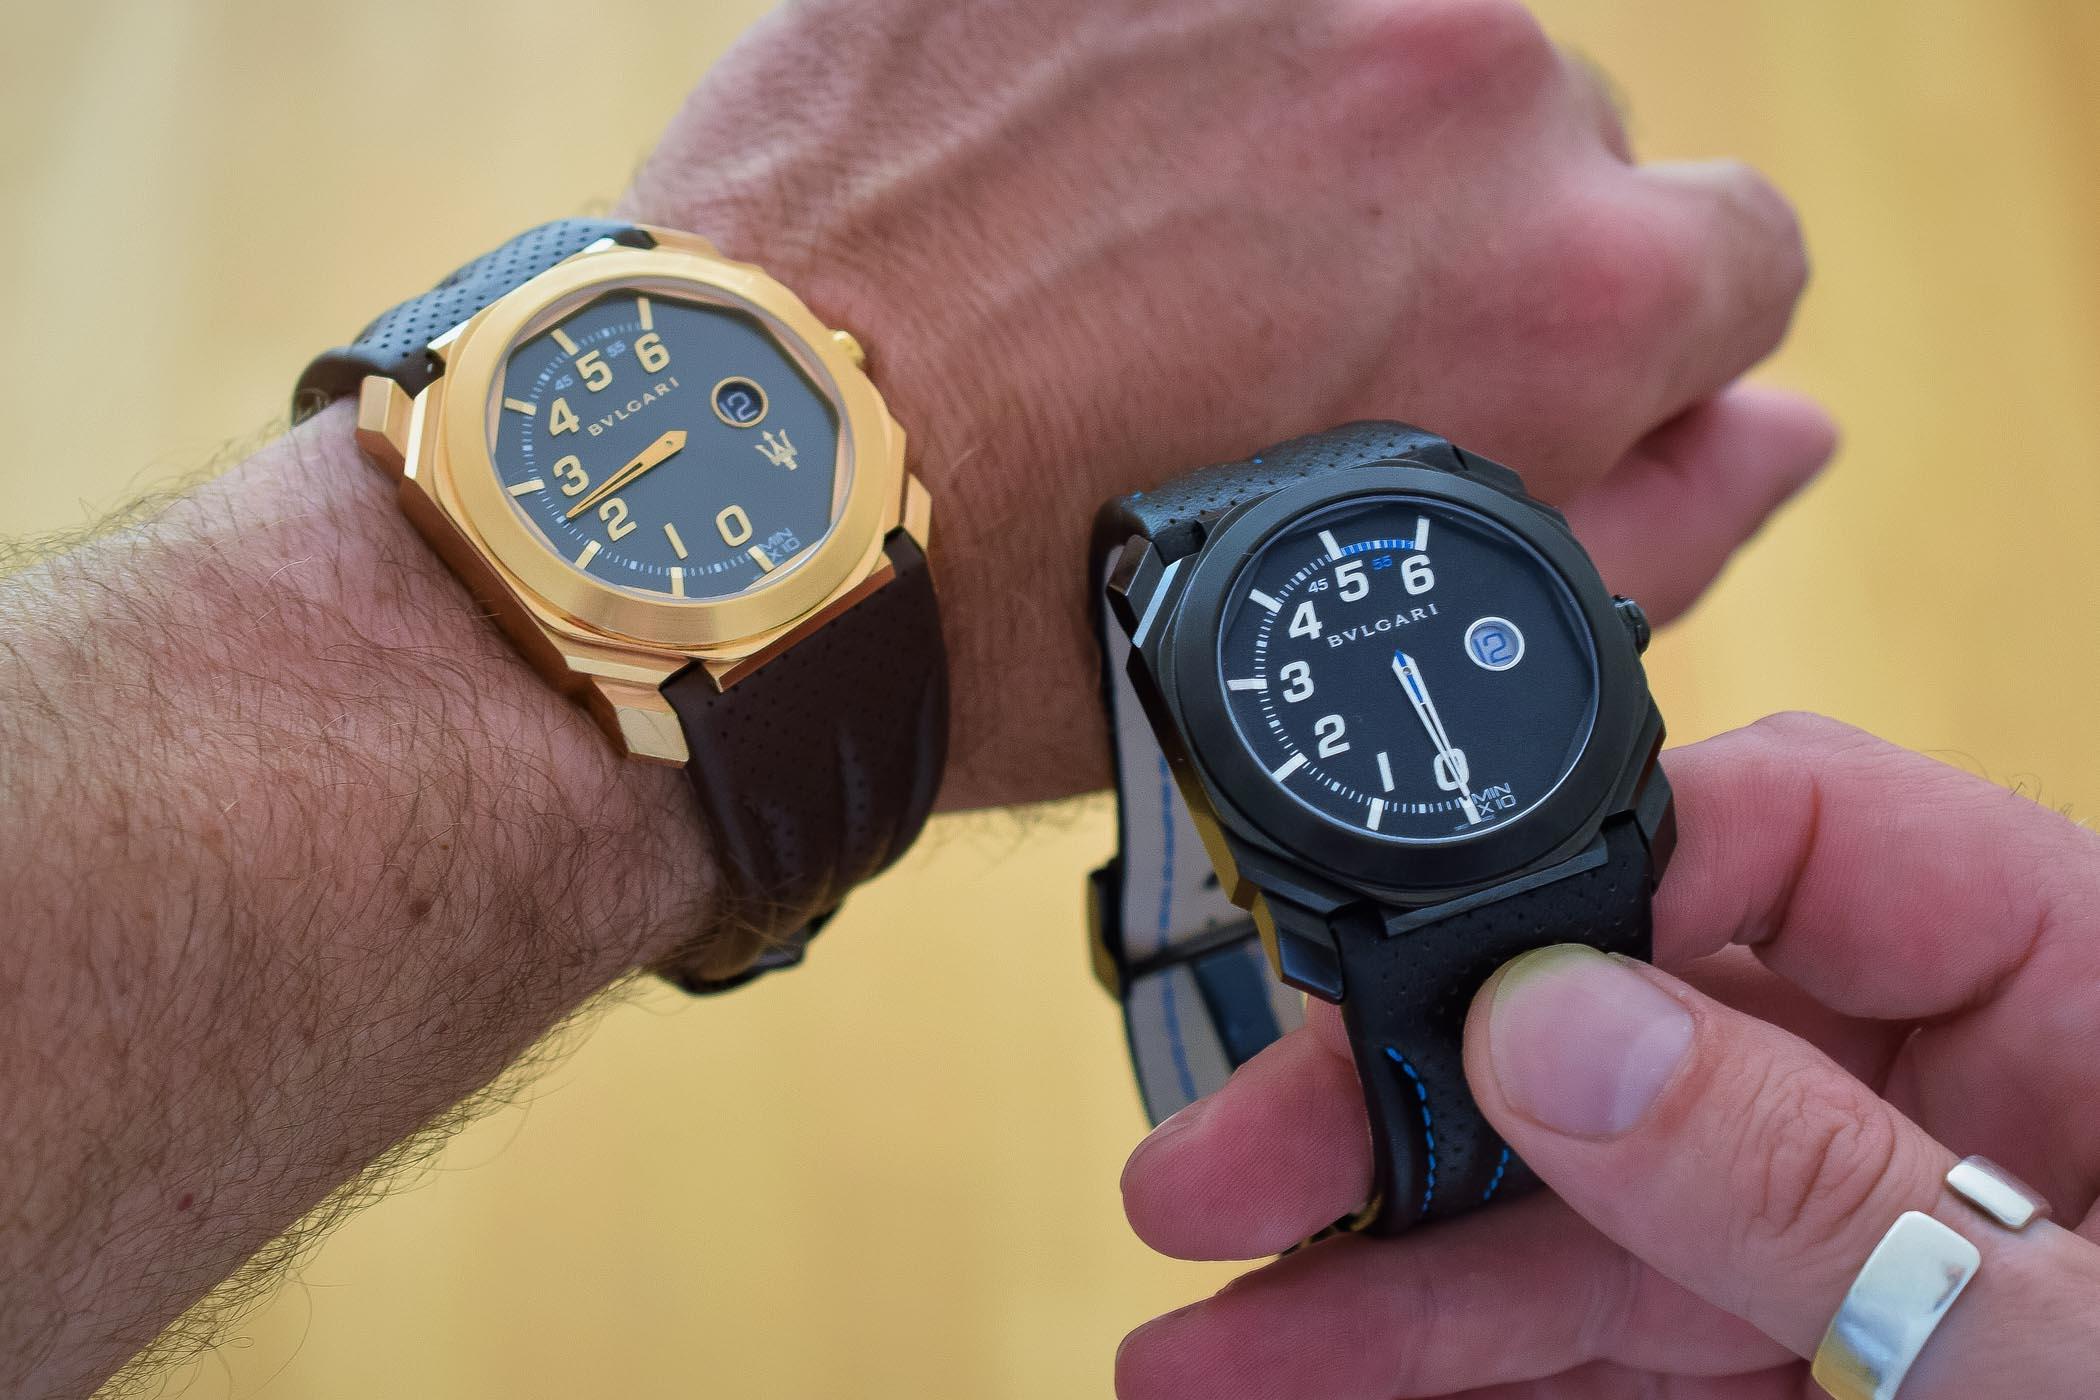 maserati Maserati & Bvlgari: The New Octo Timepieces Bulgari Octo Retro Maserati GranSport GranLusso